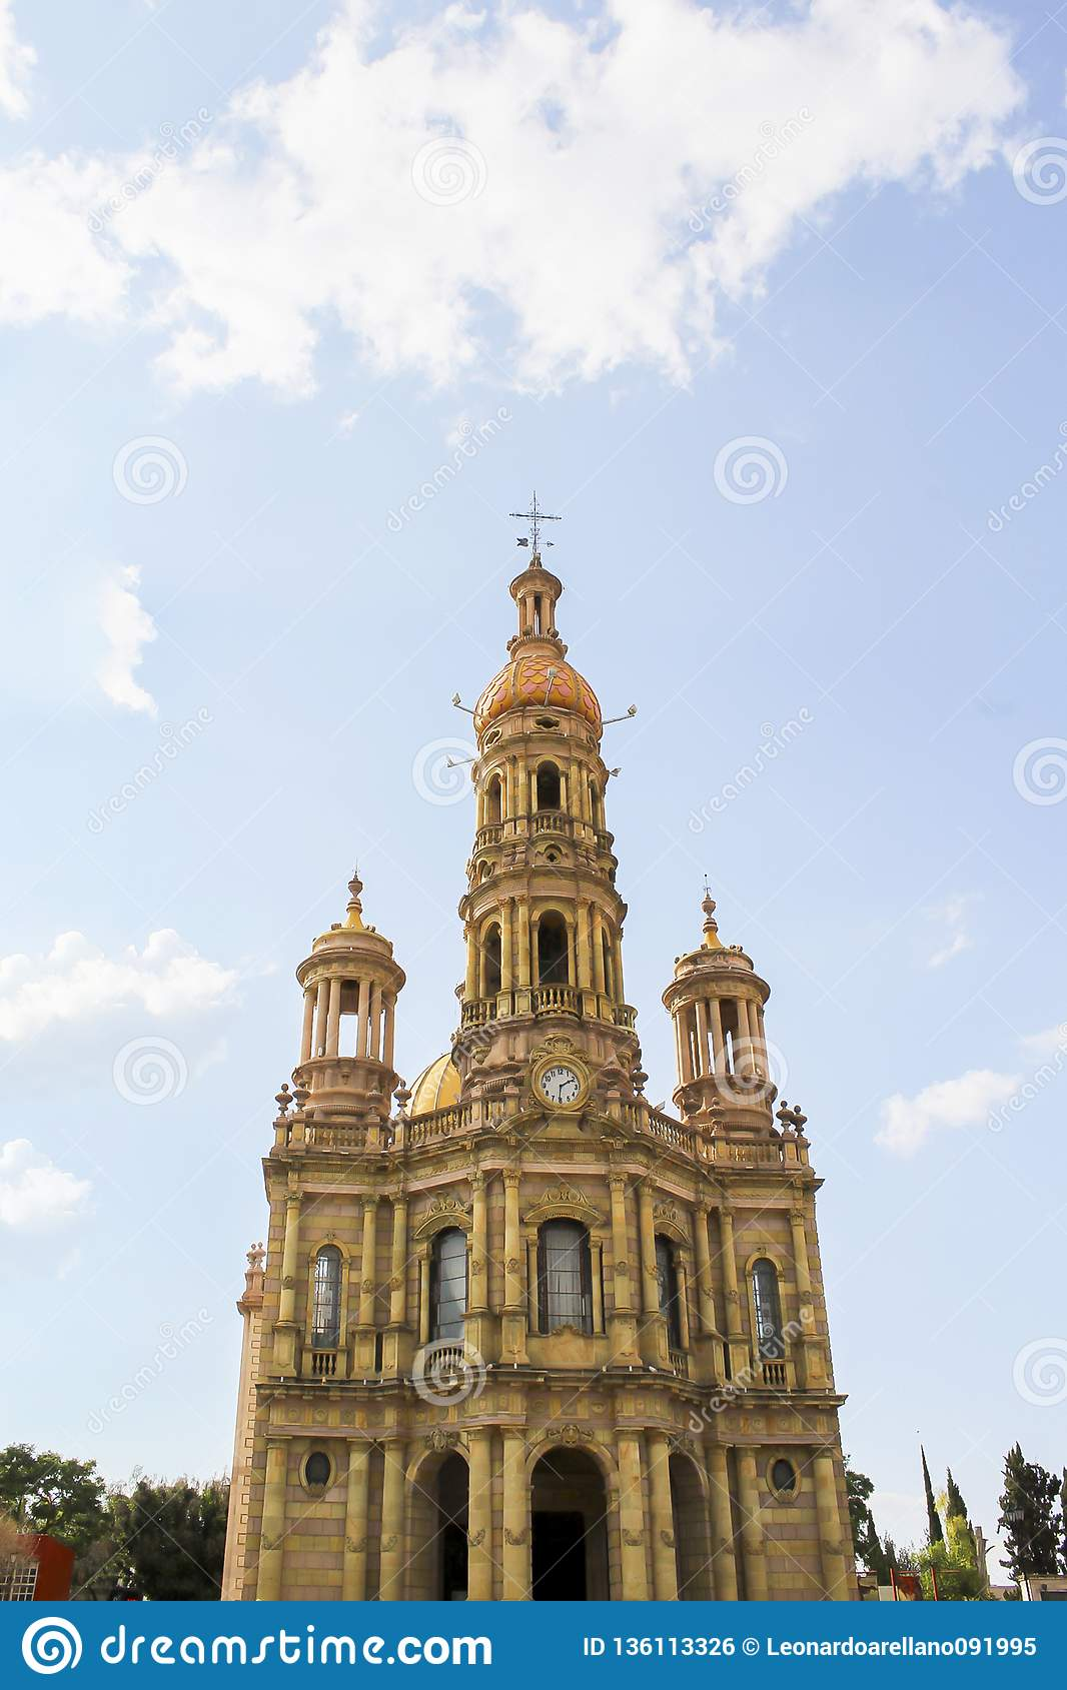 Висок Сан Антонио, в сердце Мексики